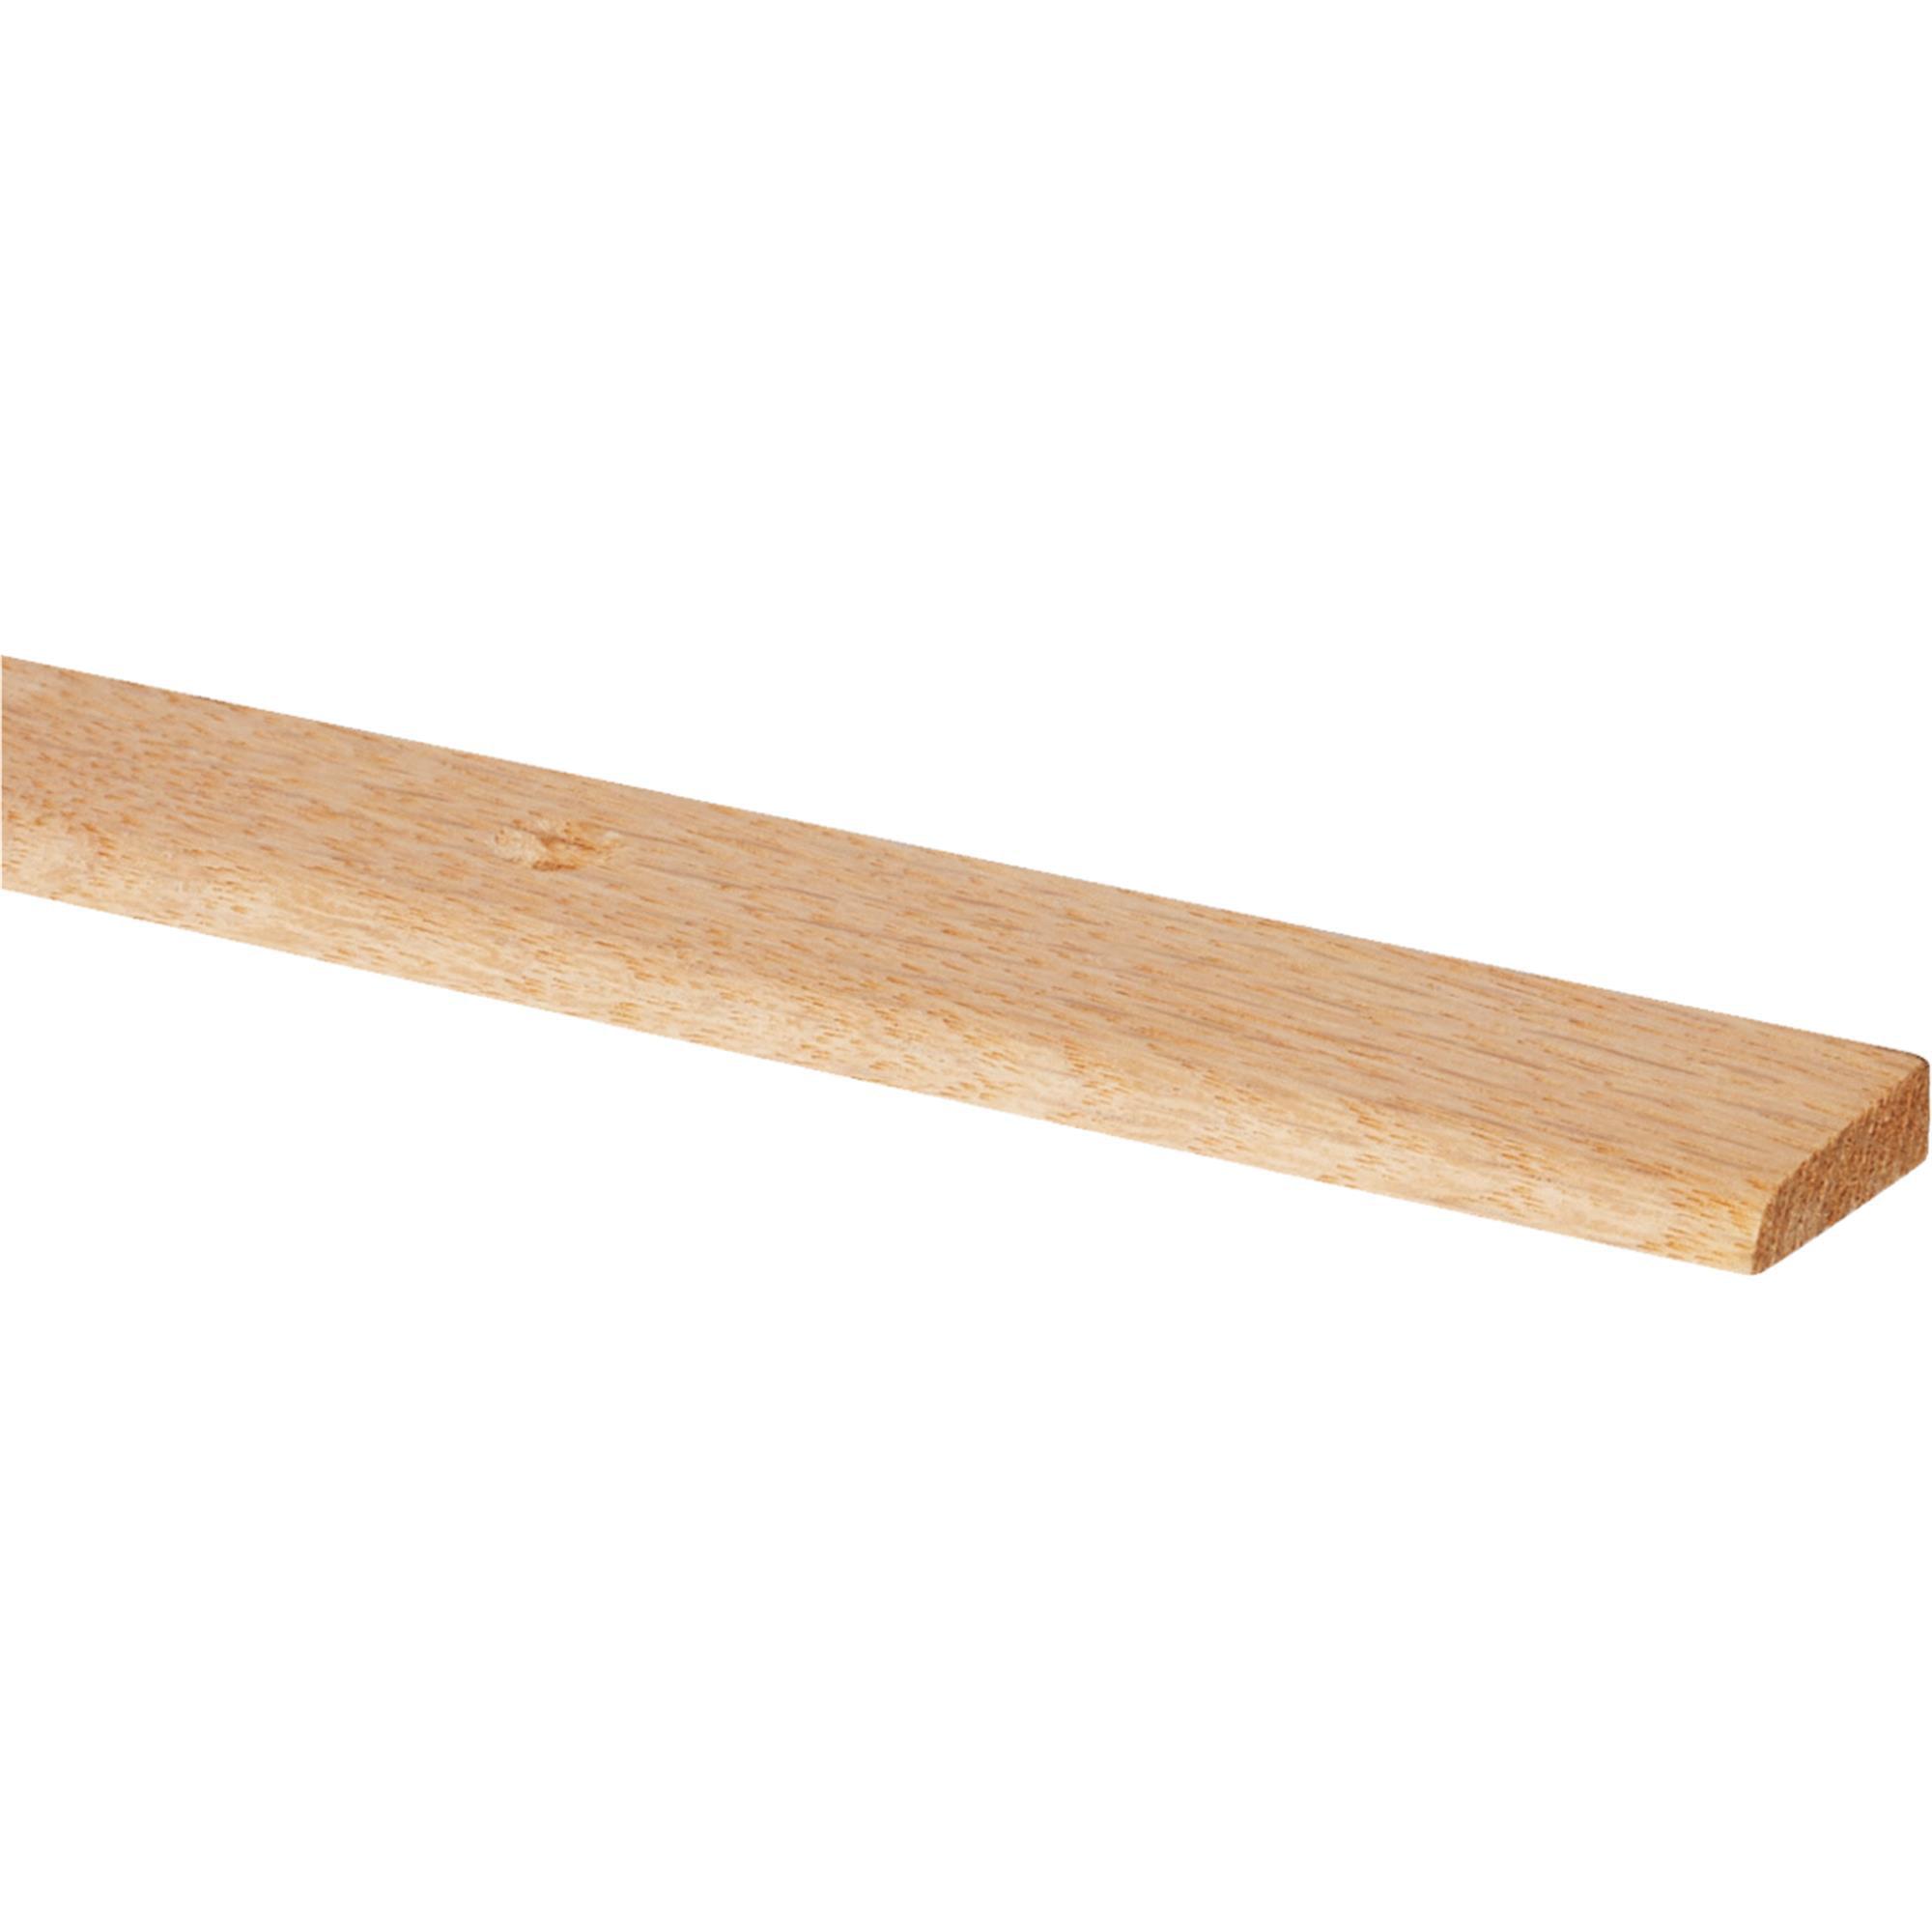 M-D Hardwood Reducer Molding